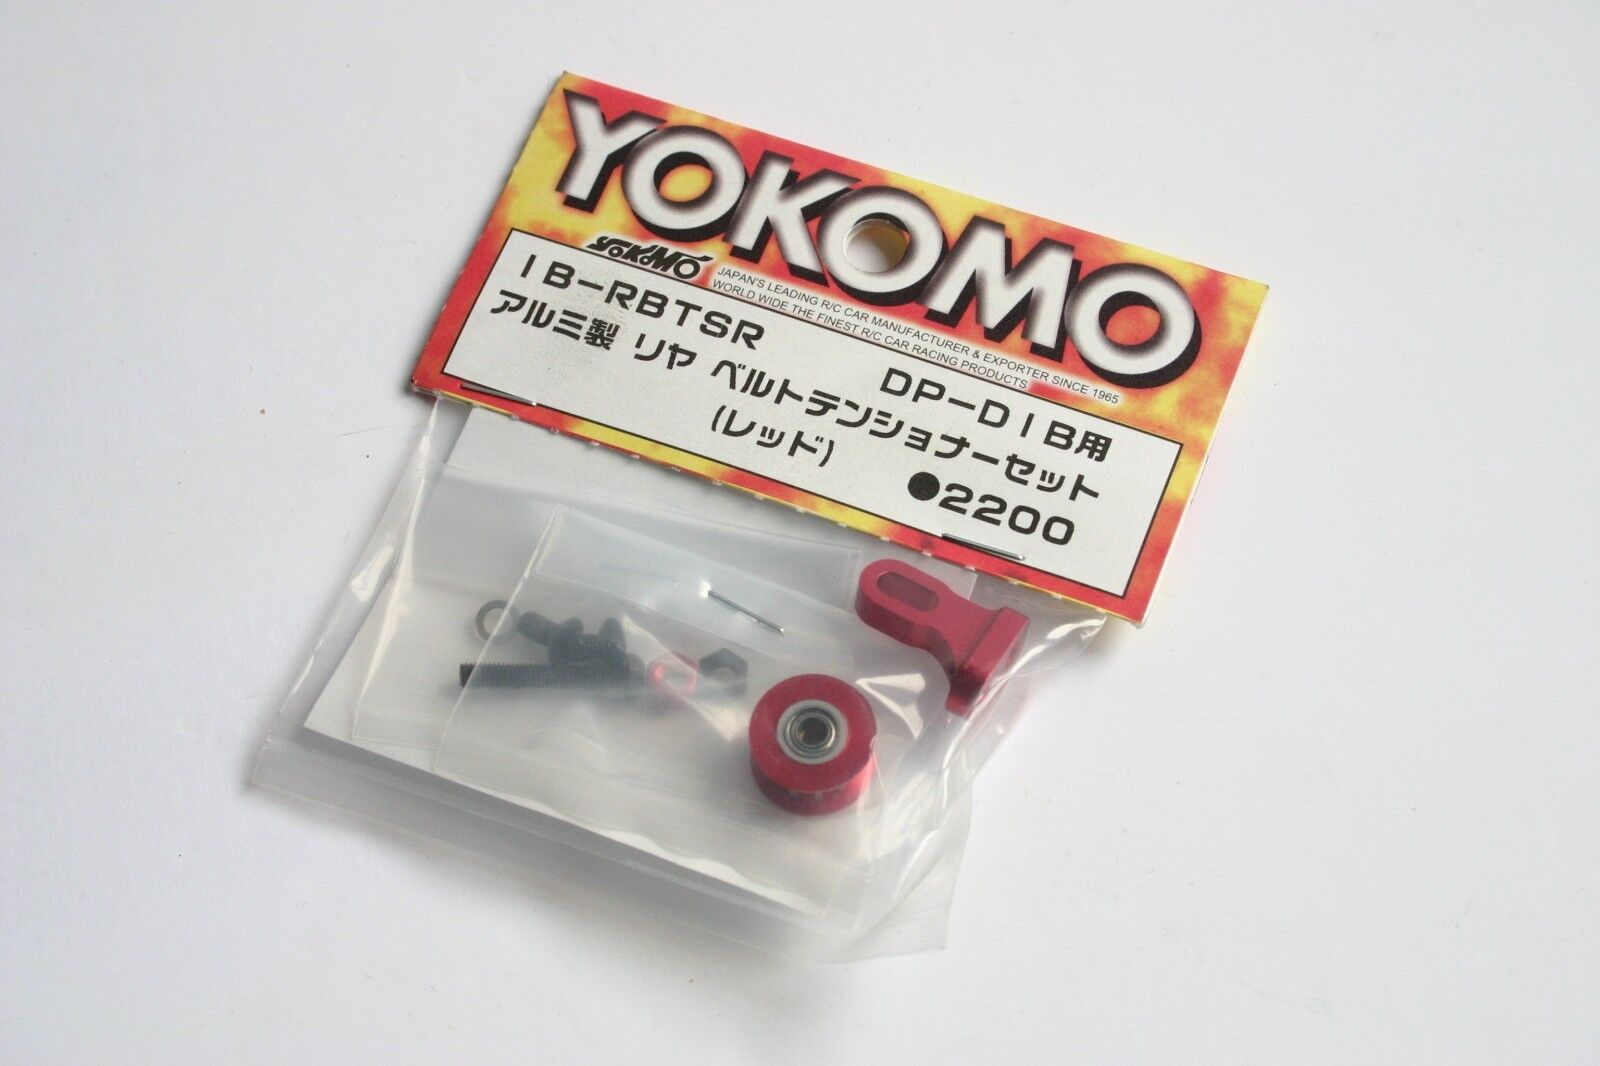 Yokomo DIB Aluminium Rear Rear Rear Belt Tension SER (Red) - IB-RBTSR DP-DIB Drift 4f9da8